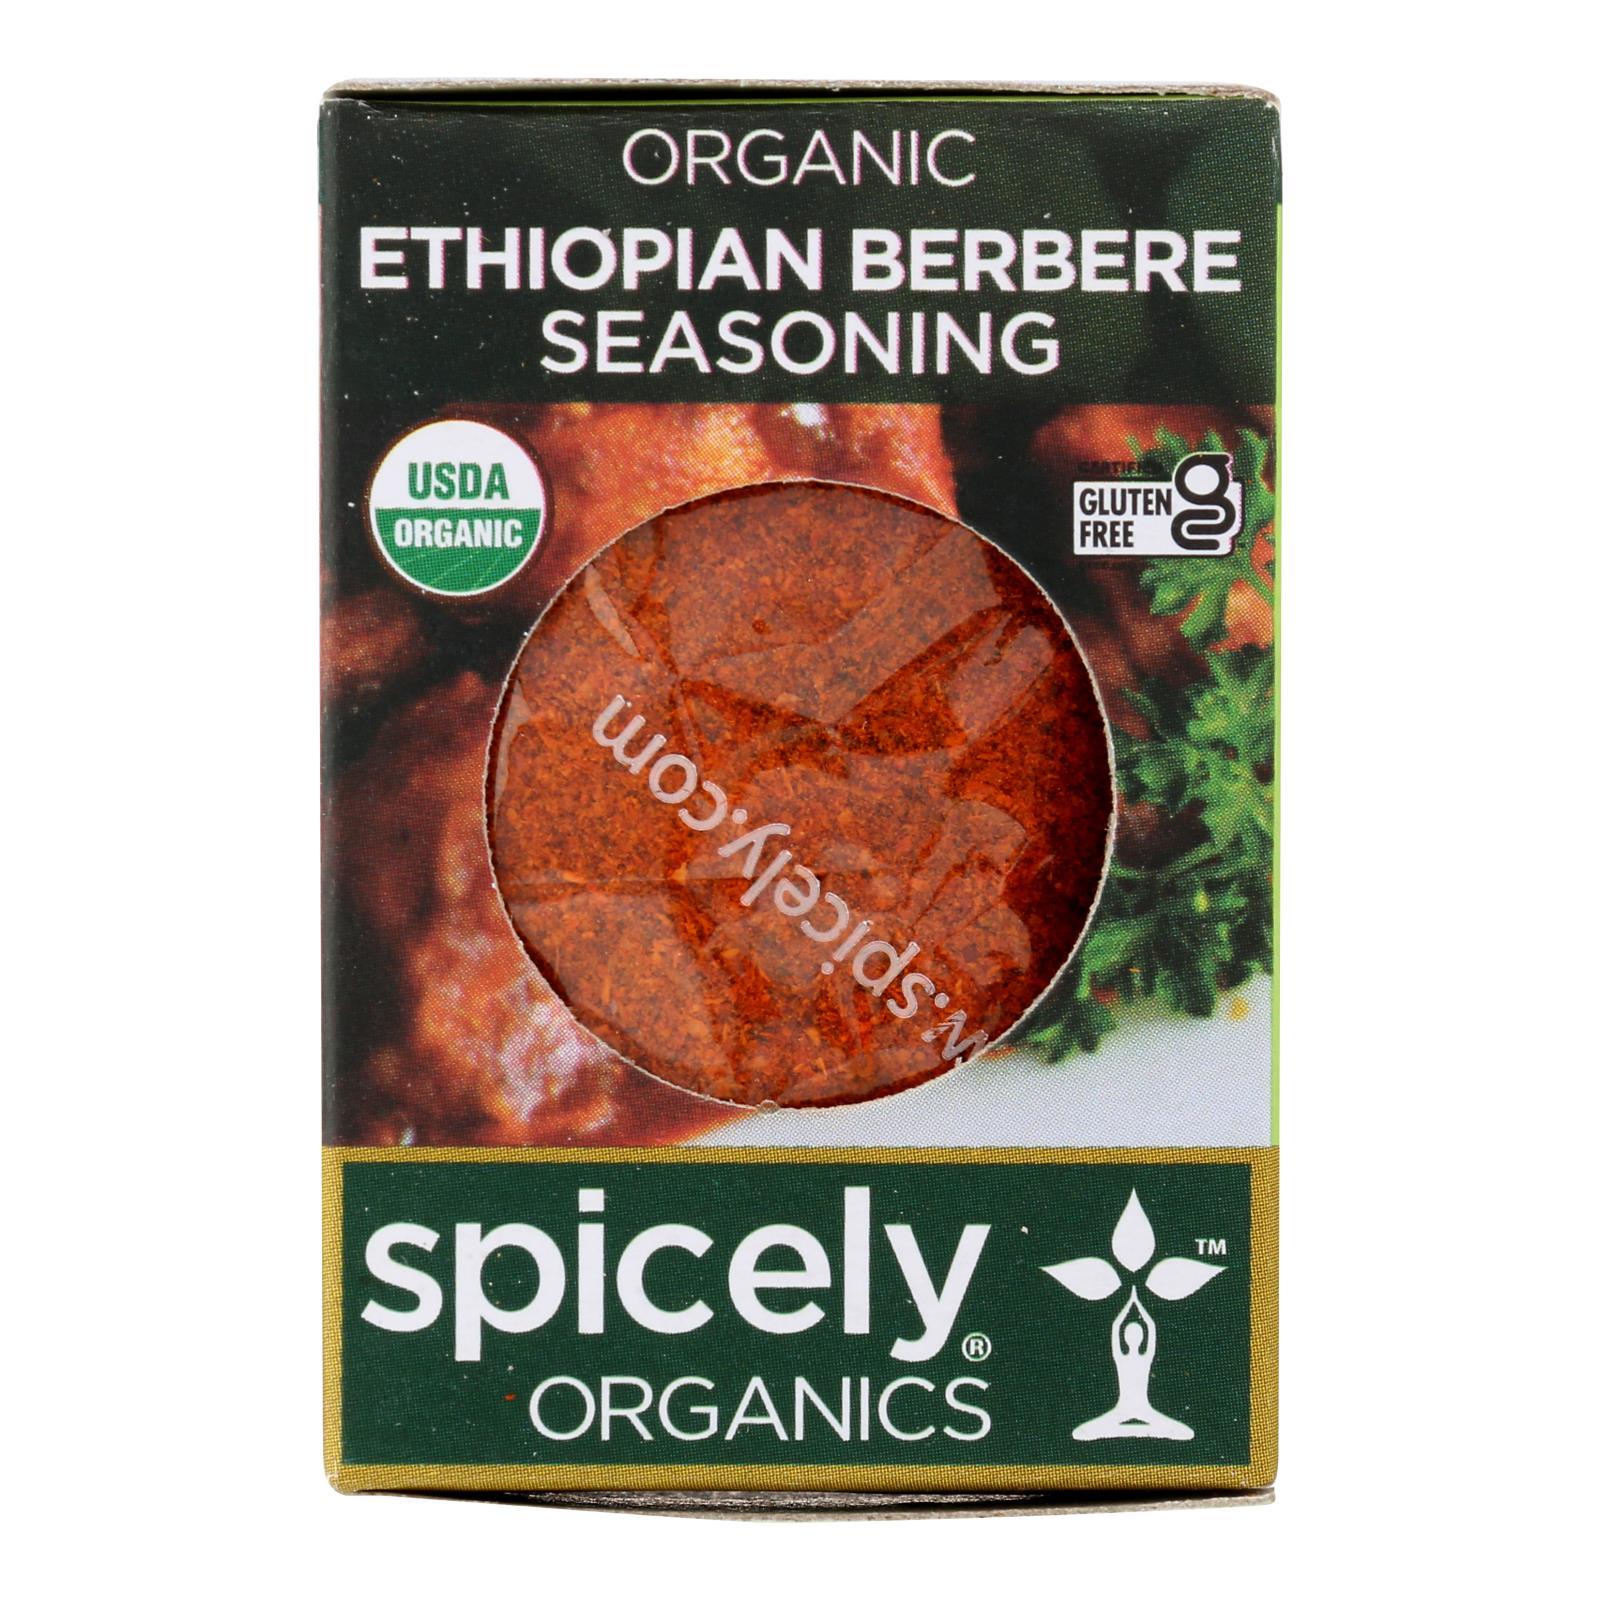 Spicely Organics - Organic Ethiopian Berbere Seasoning - Case of 6 - 0.4 oz.